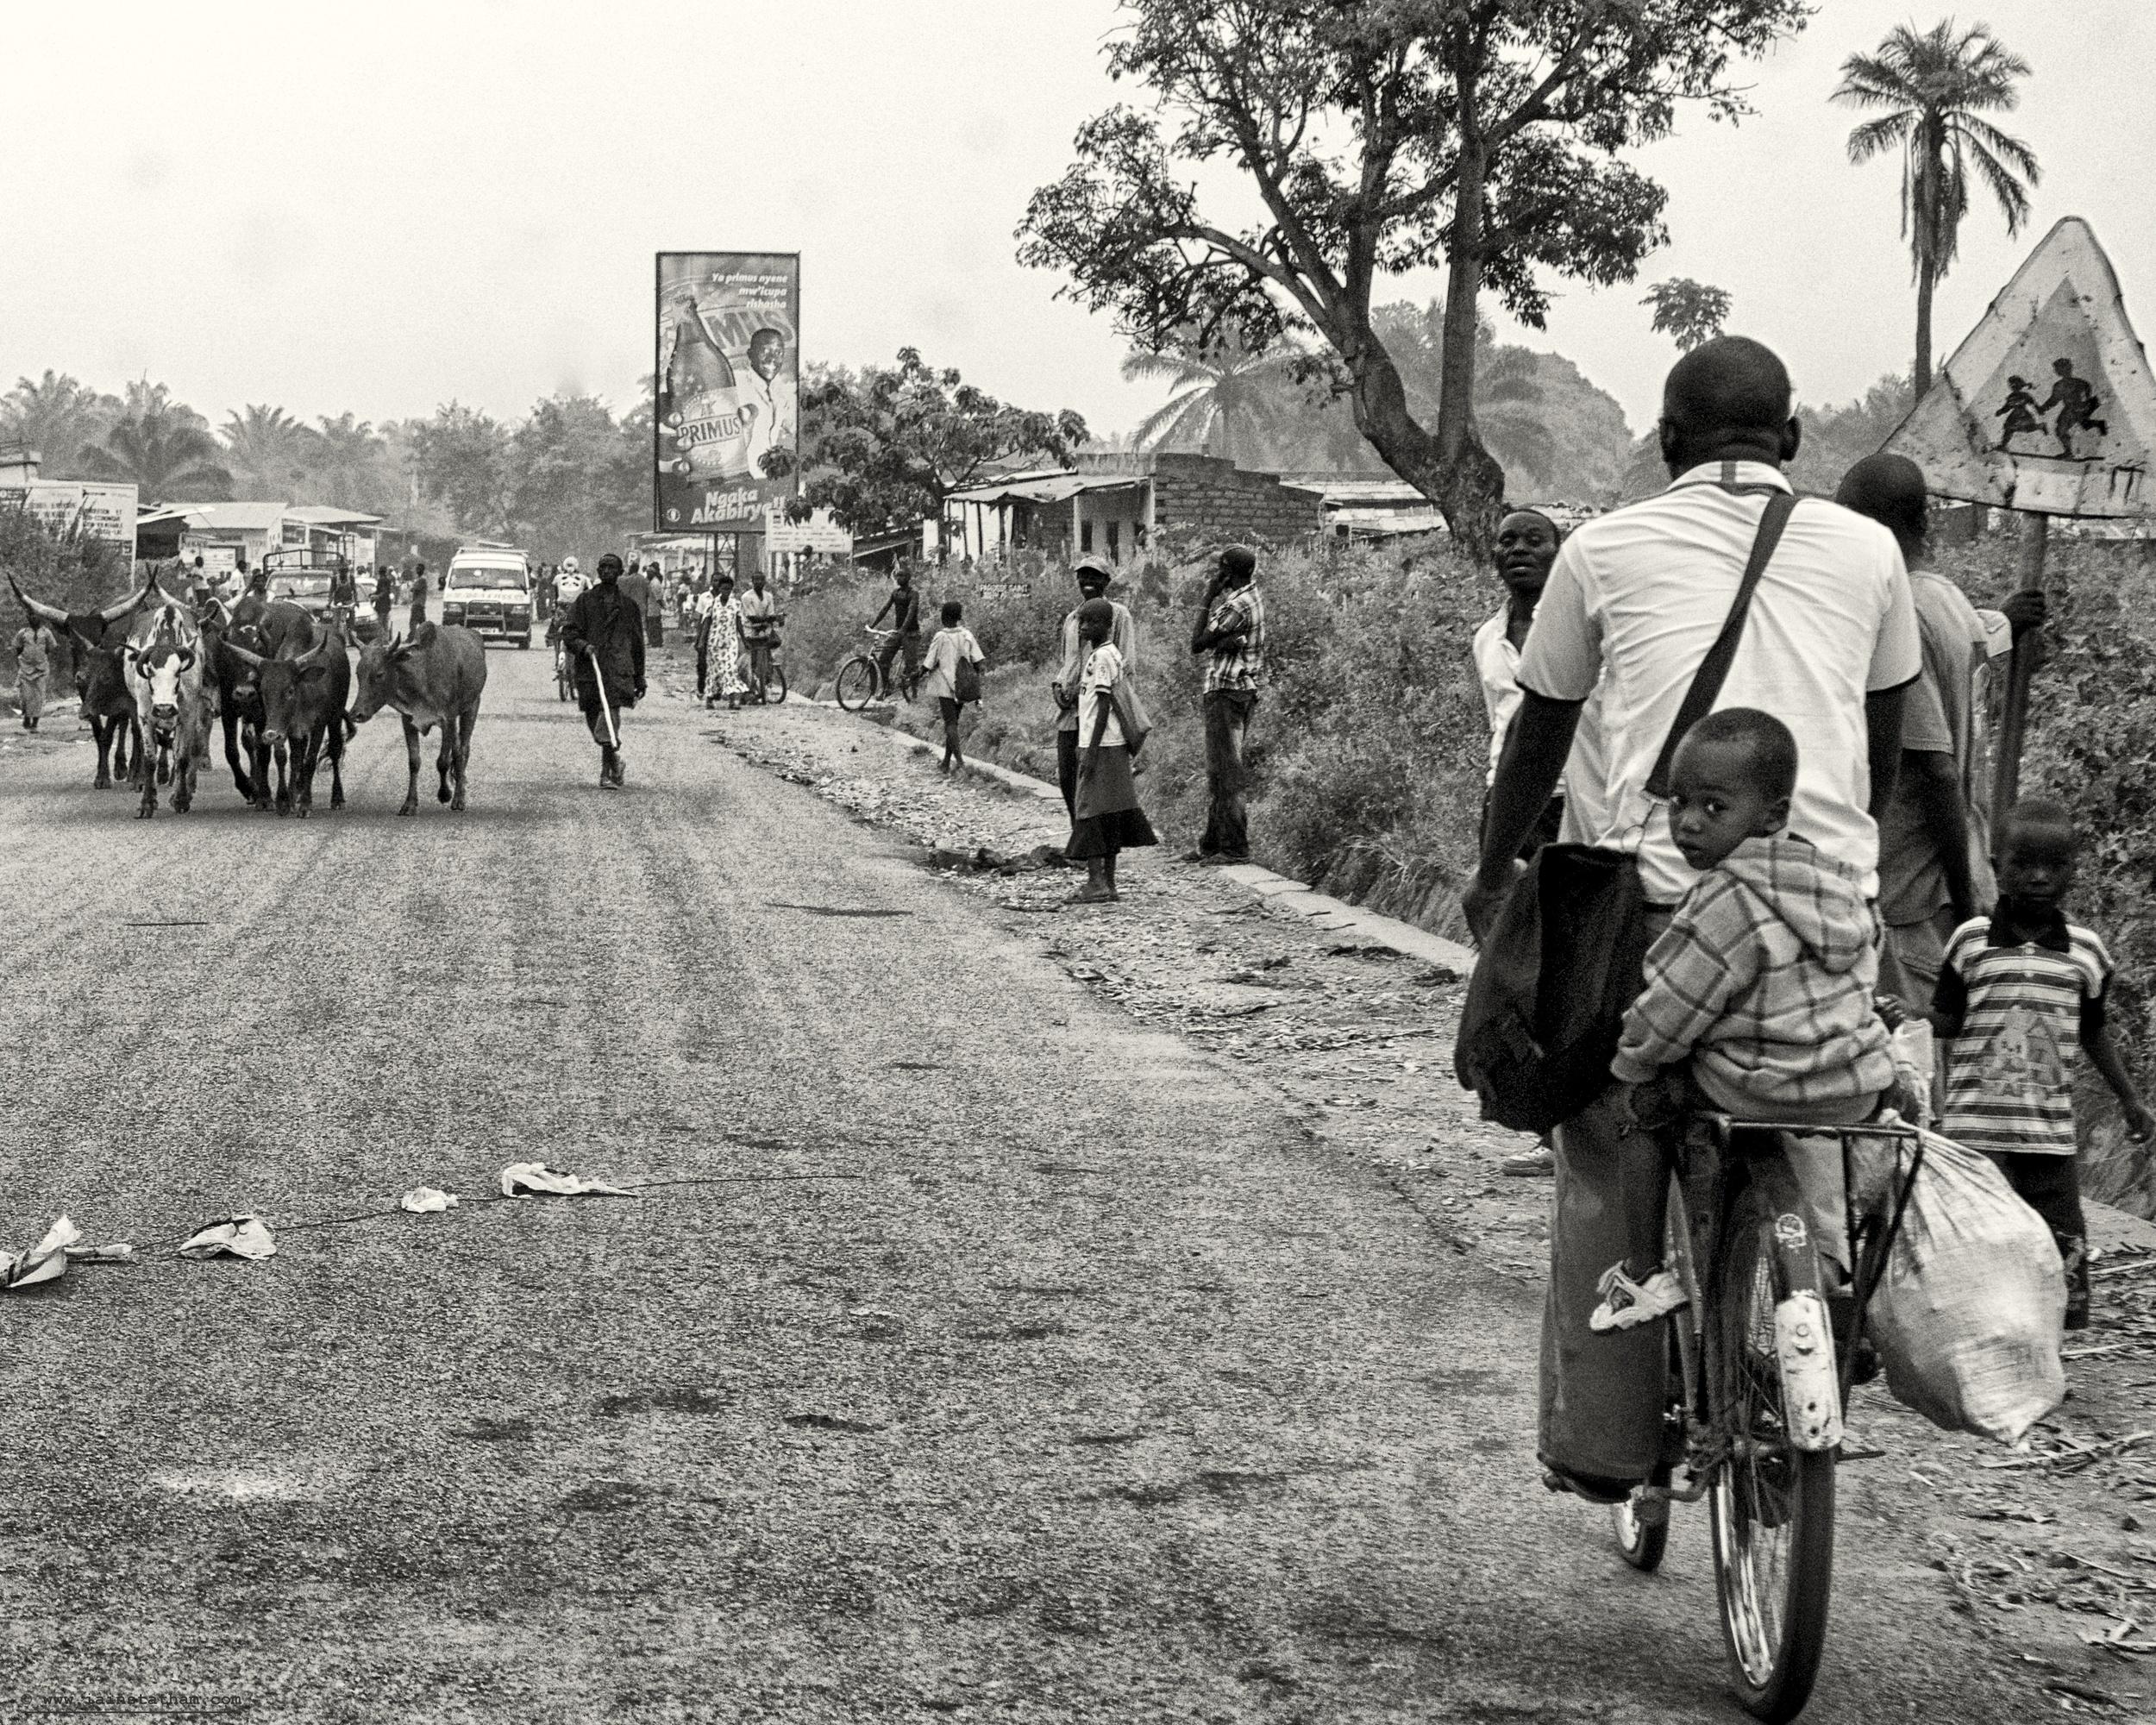 burundi bw feb 14 9.jpg